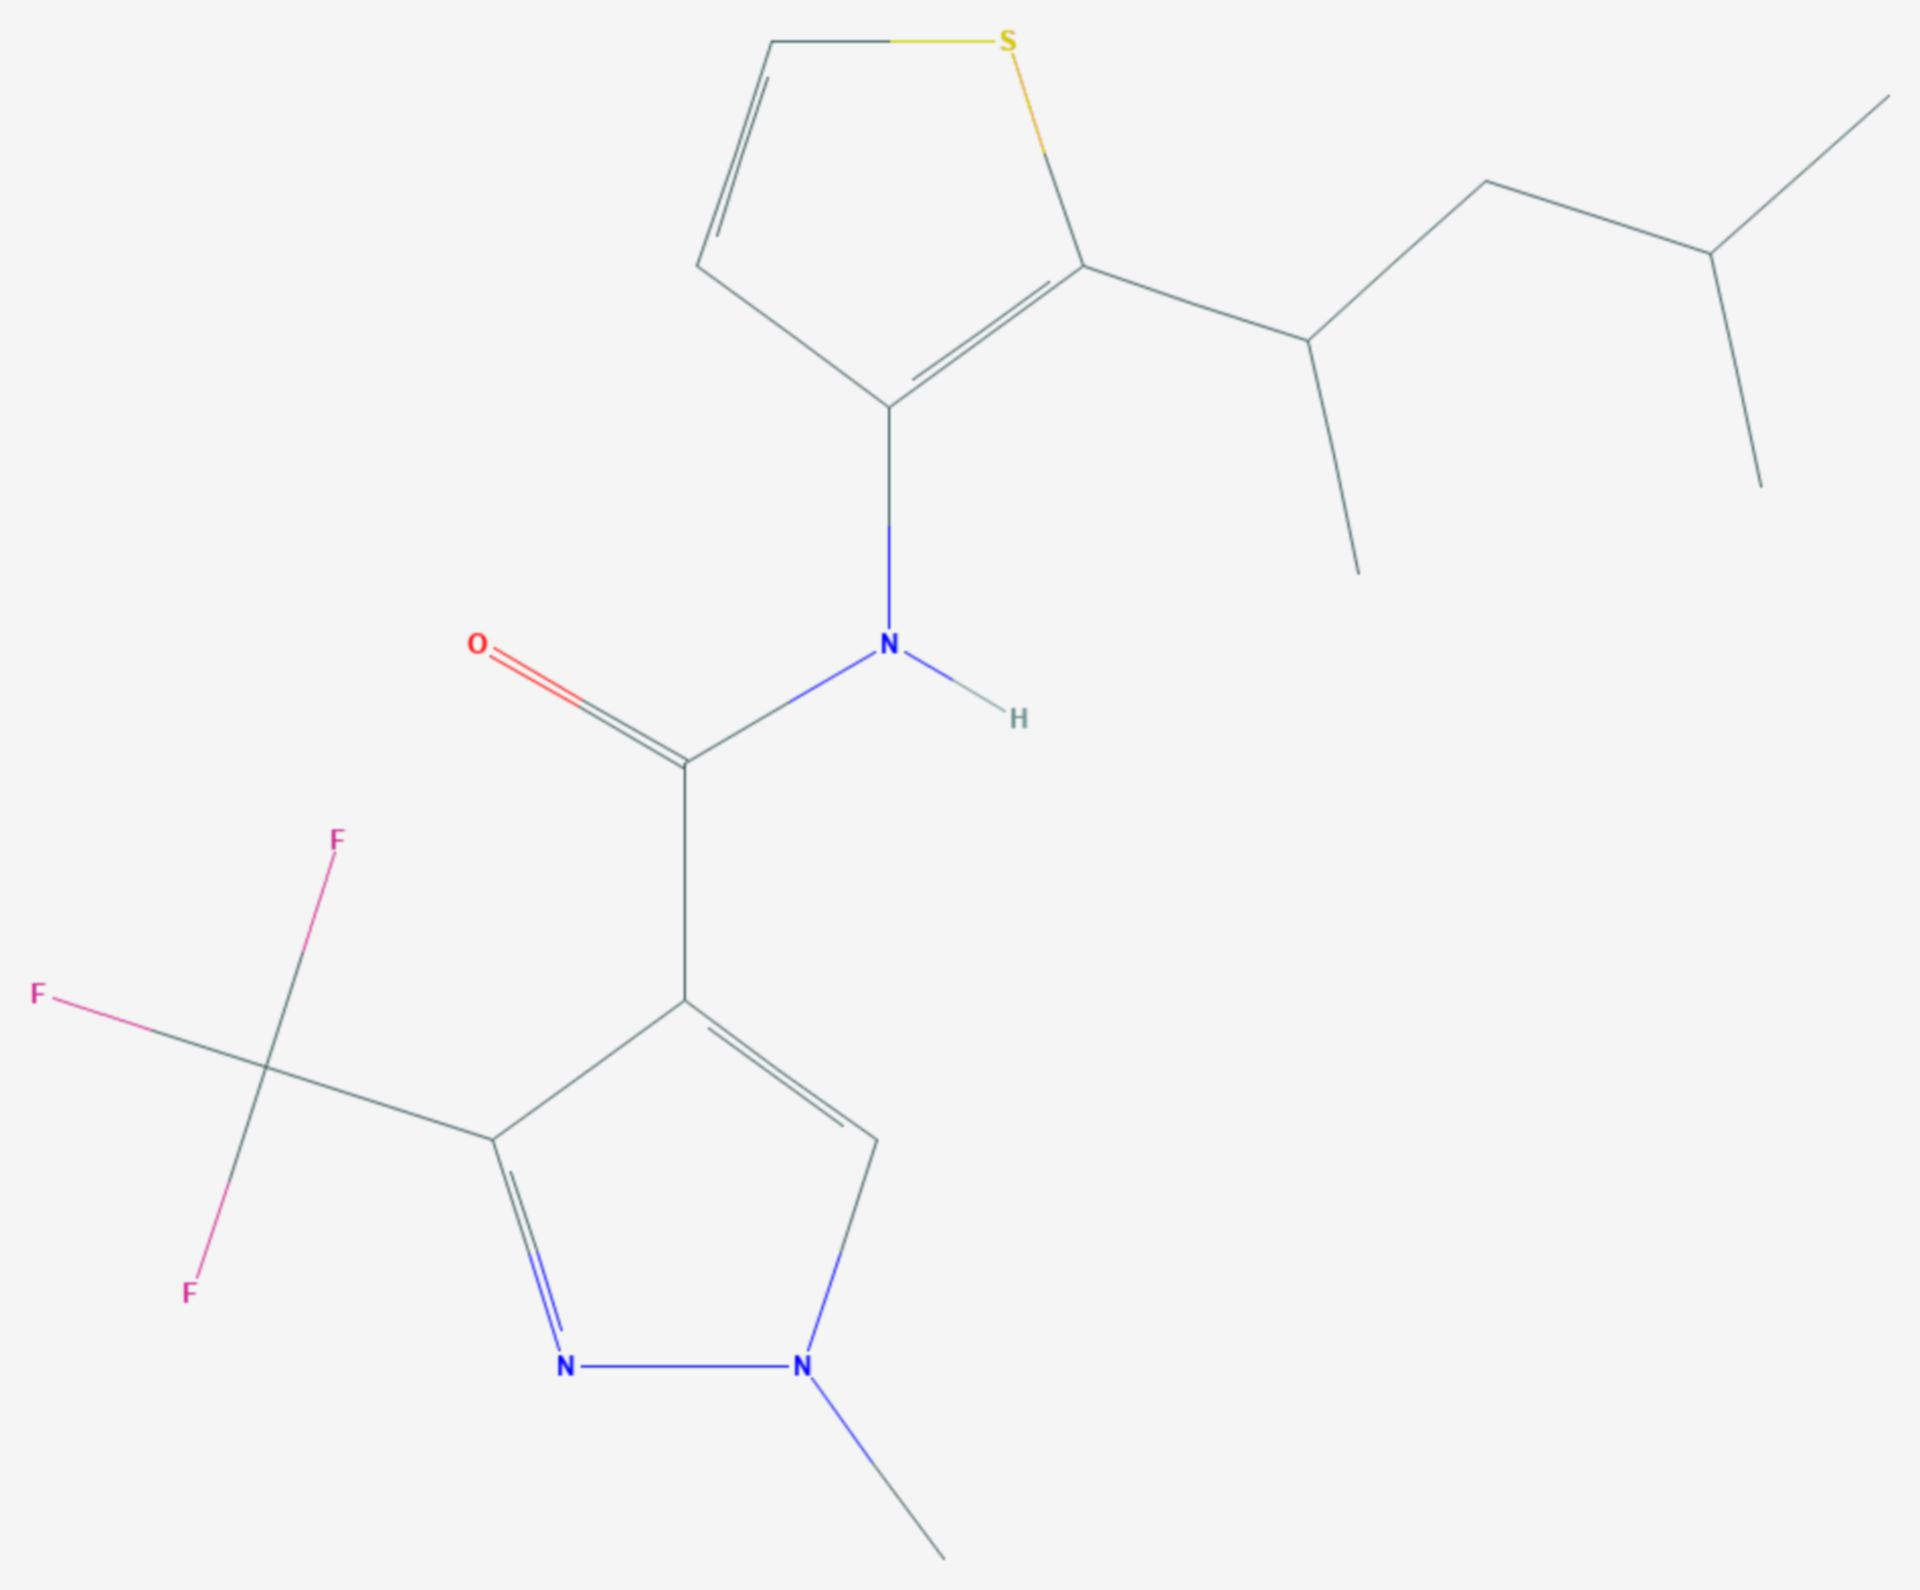 Penthiopyrad (Strukturformel)